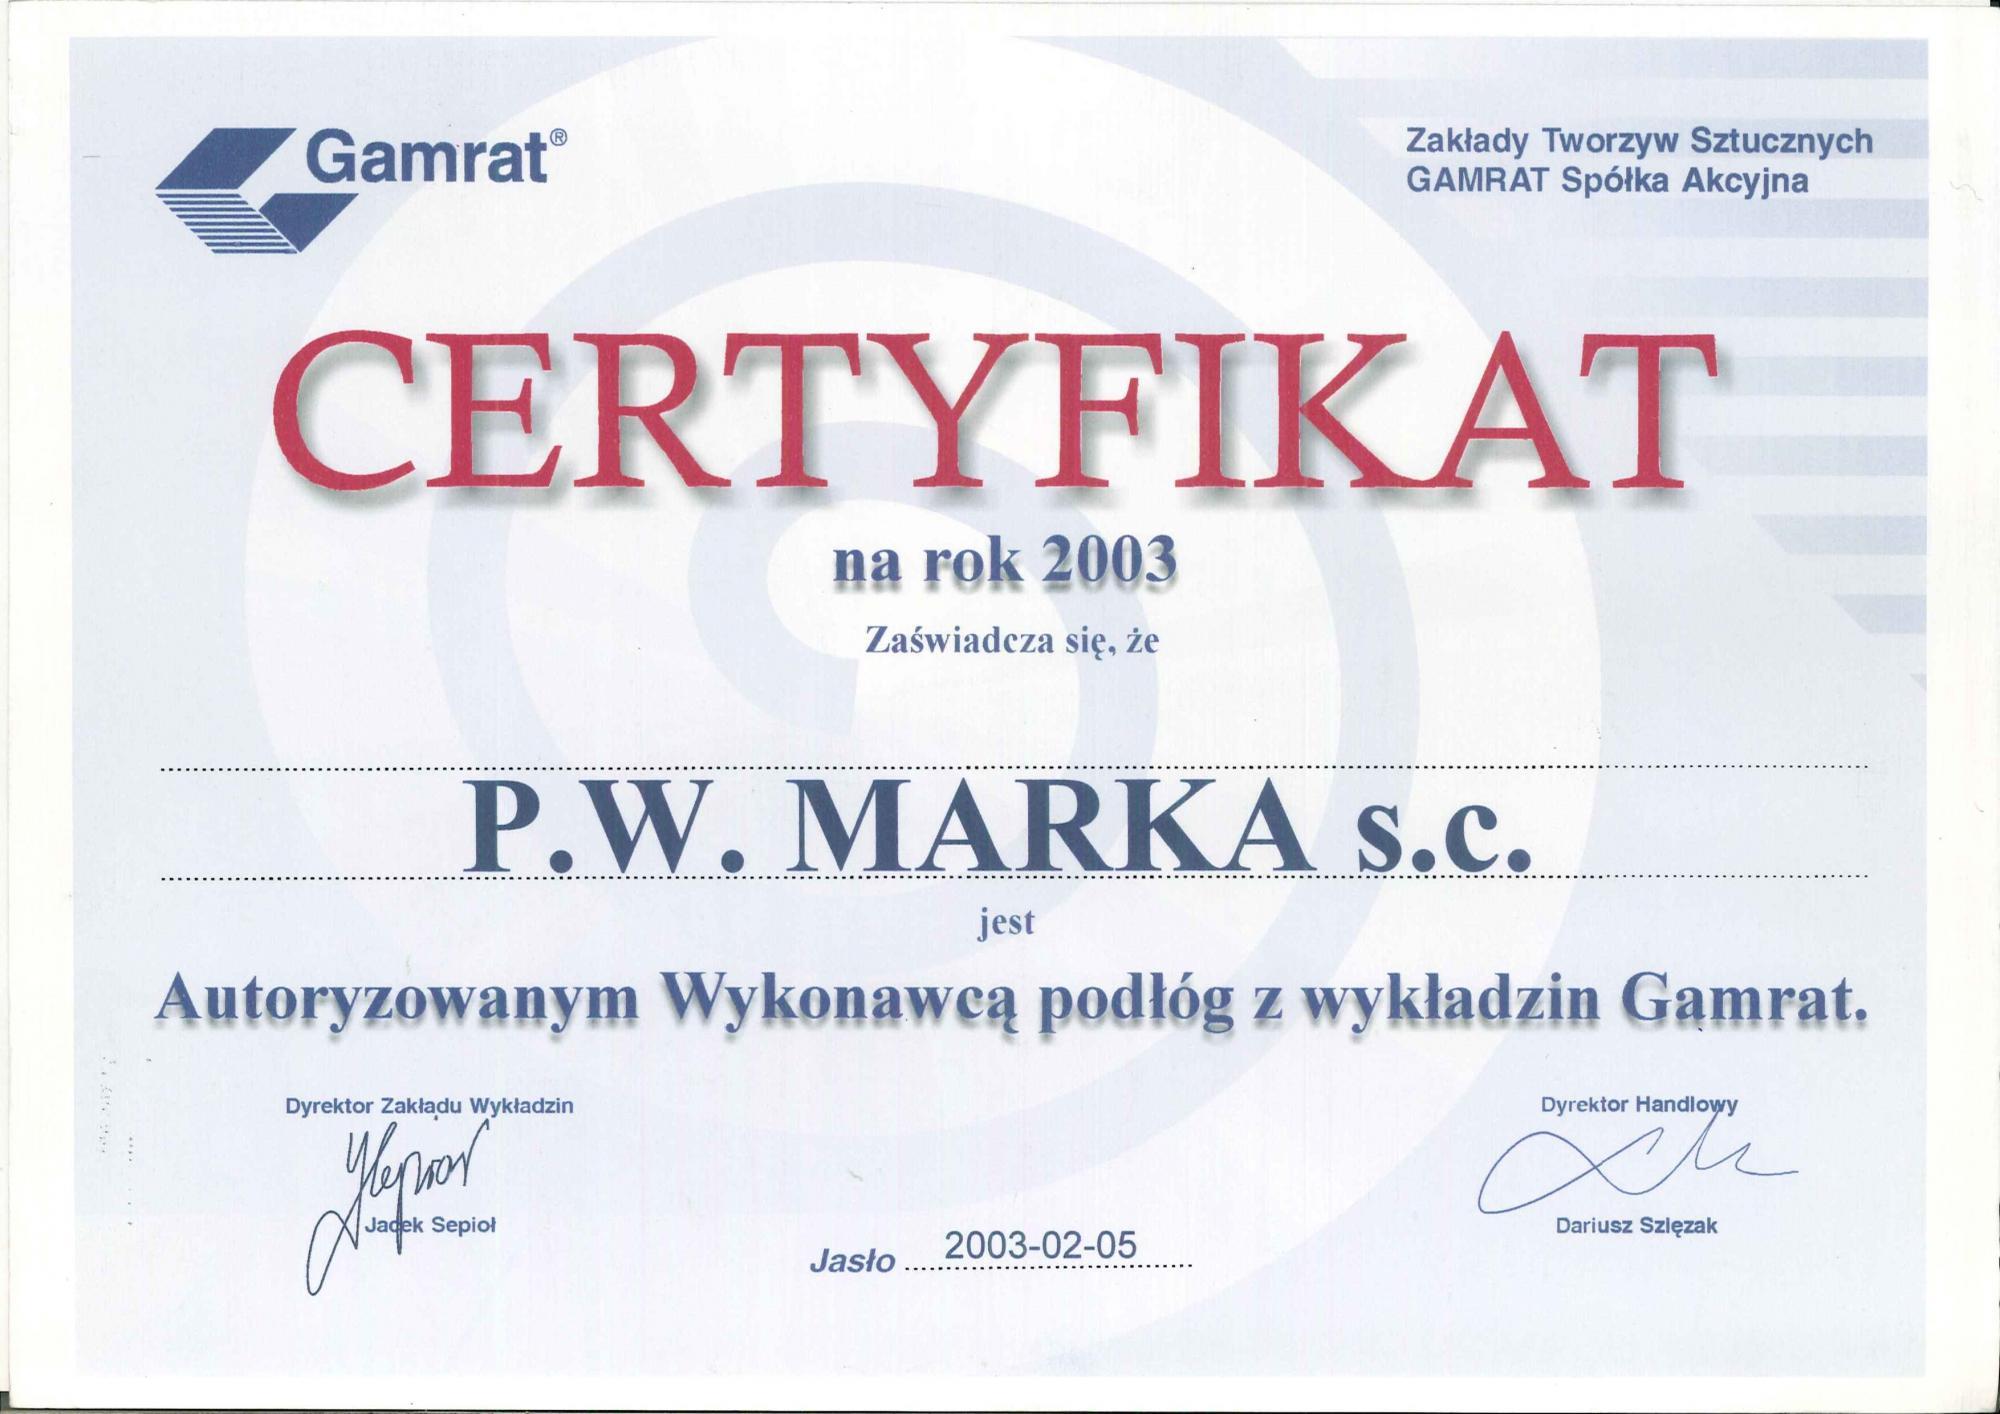 Certyfikat gamrat 2003